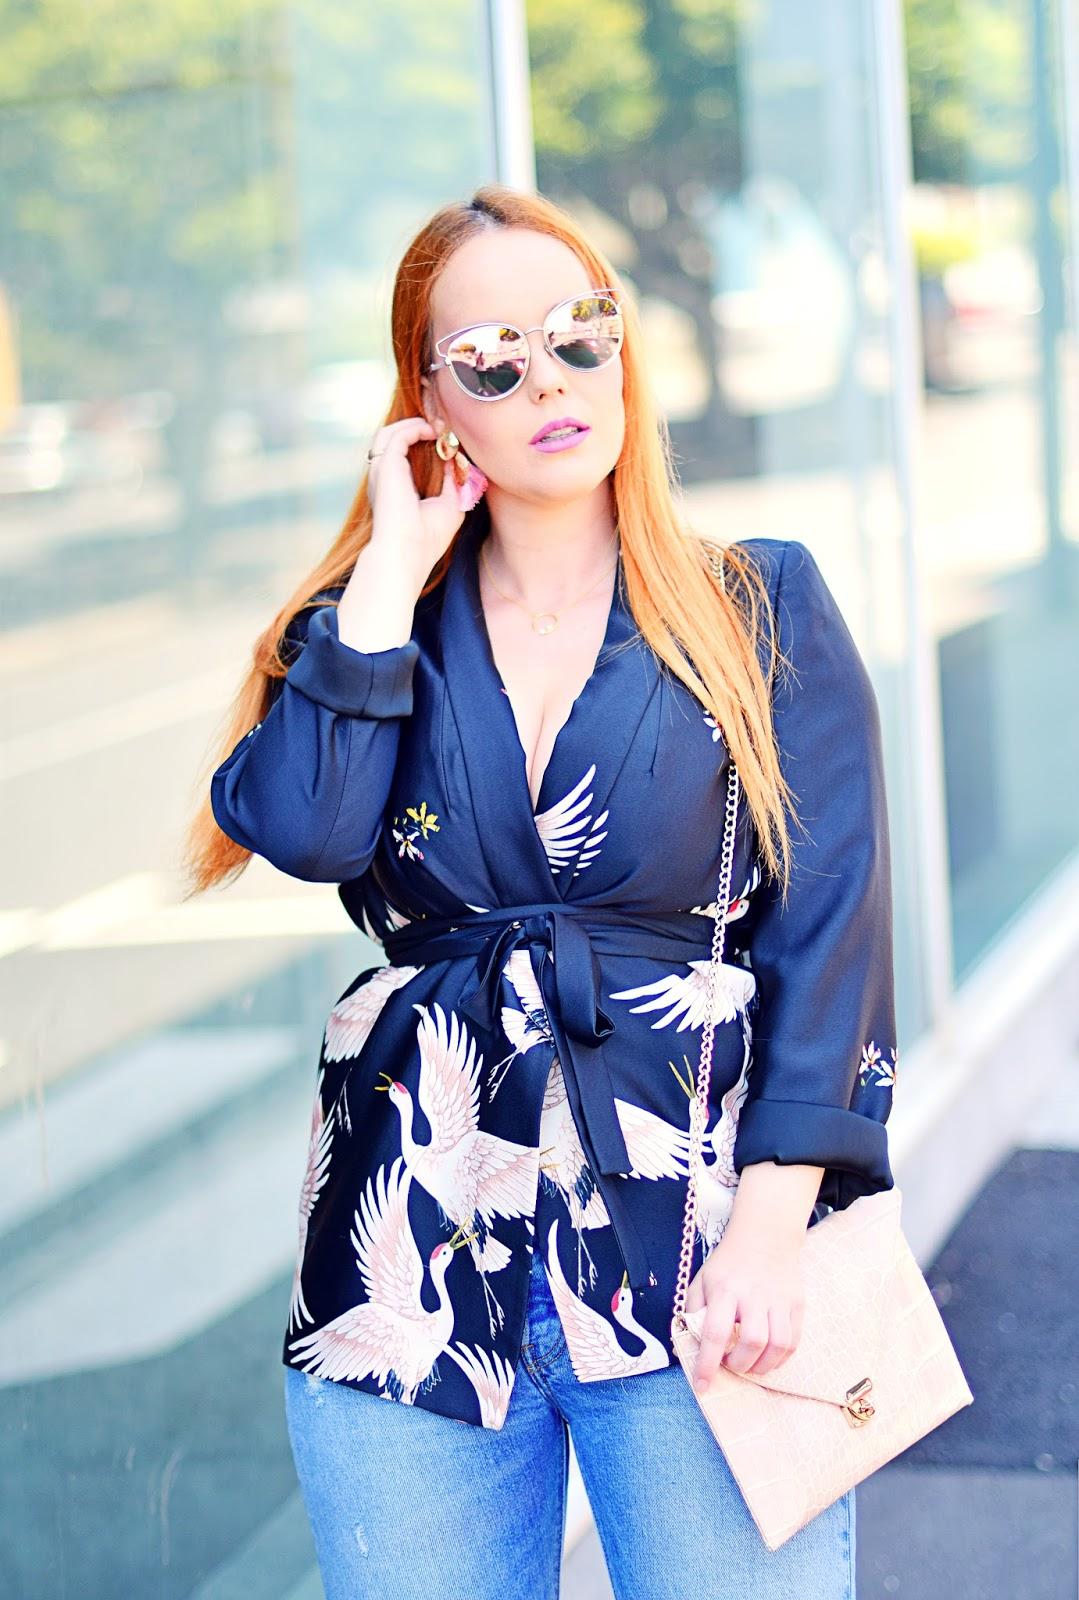 nery hdez, levi's 501, pdpaola, kimono, zapatos rosa, opticalh, Dior